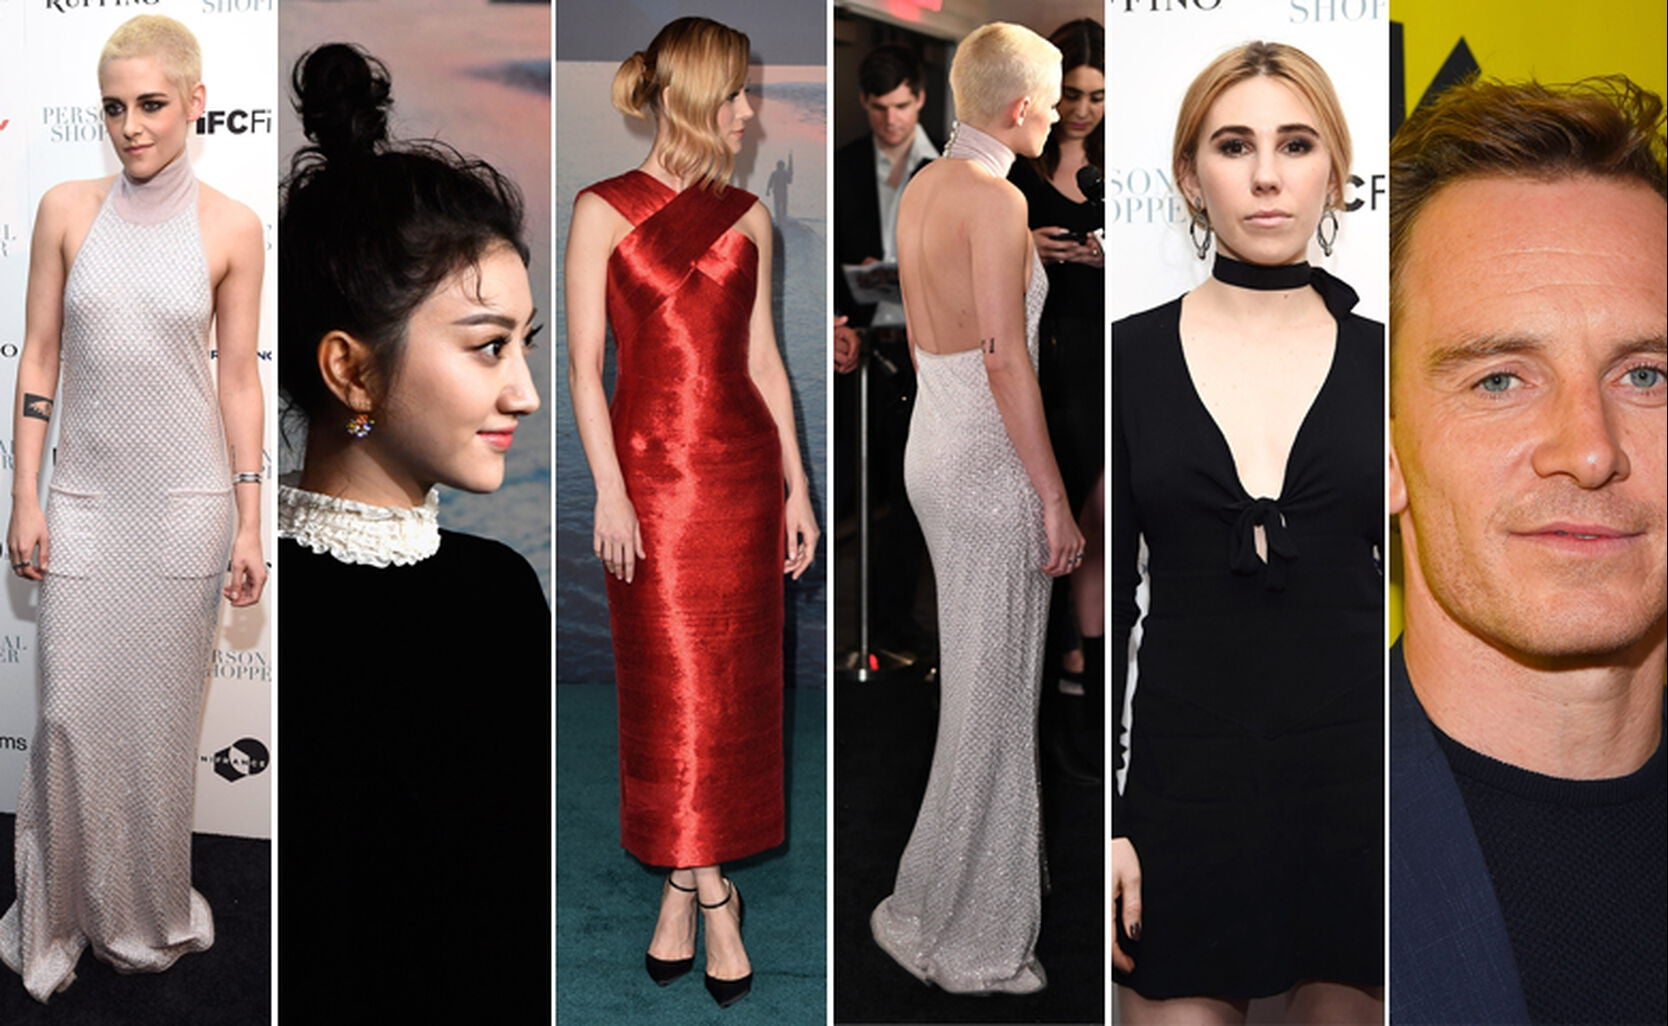 Kristen Stewart, Tian Jing, Brie Larson, Kristen Stewart, Zosia Mamet and Michael Fassbender